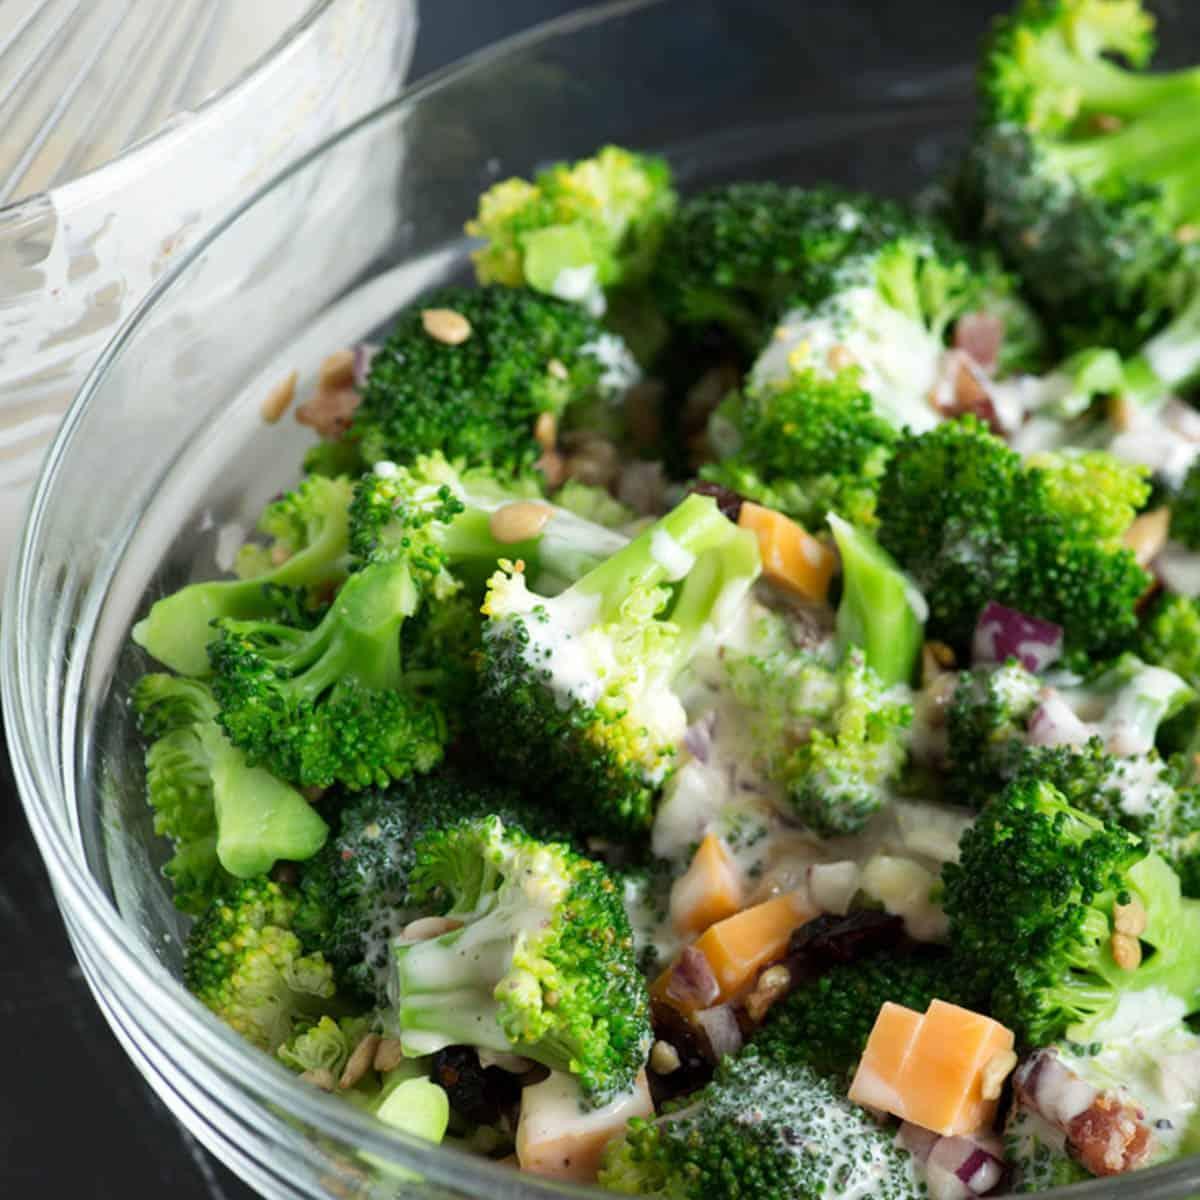 A bowl of bacon broccoli salad